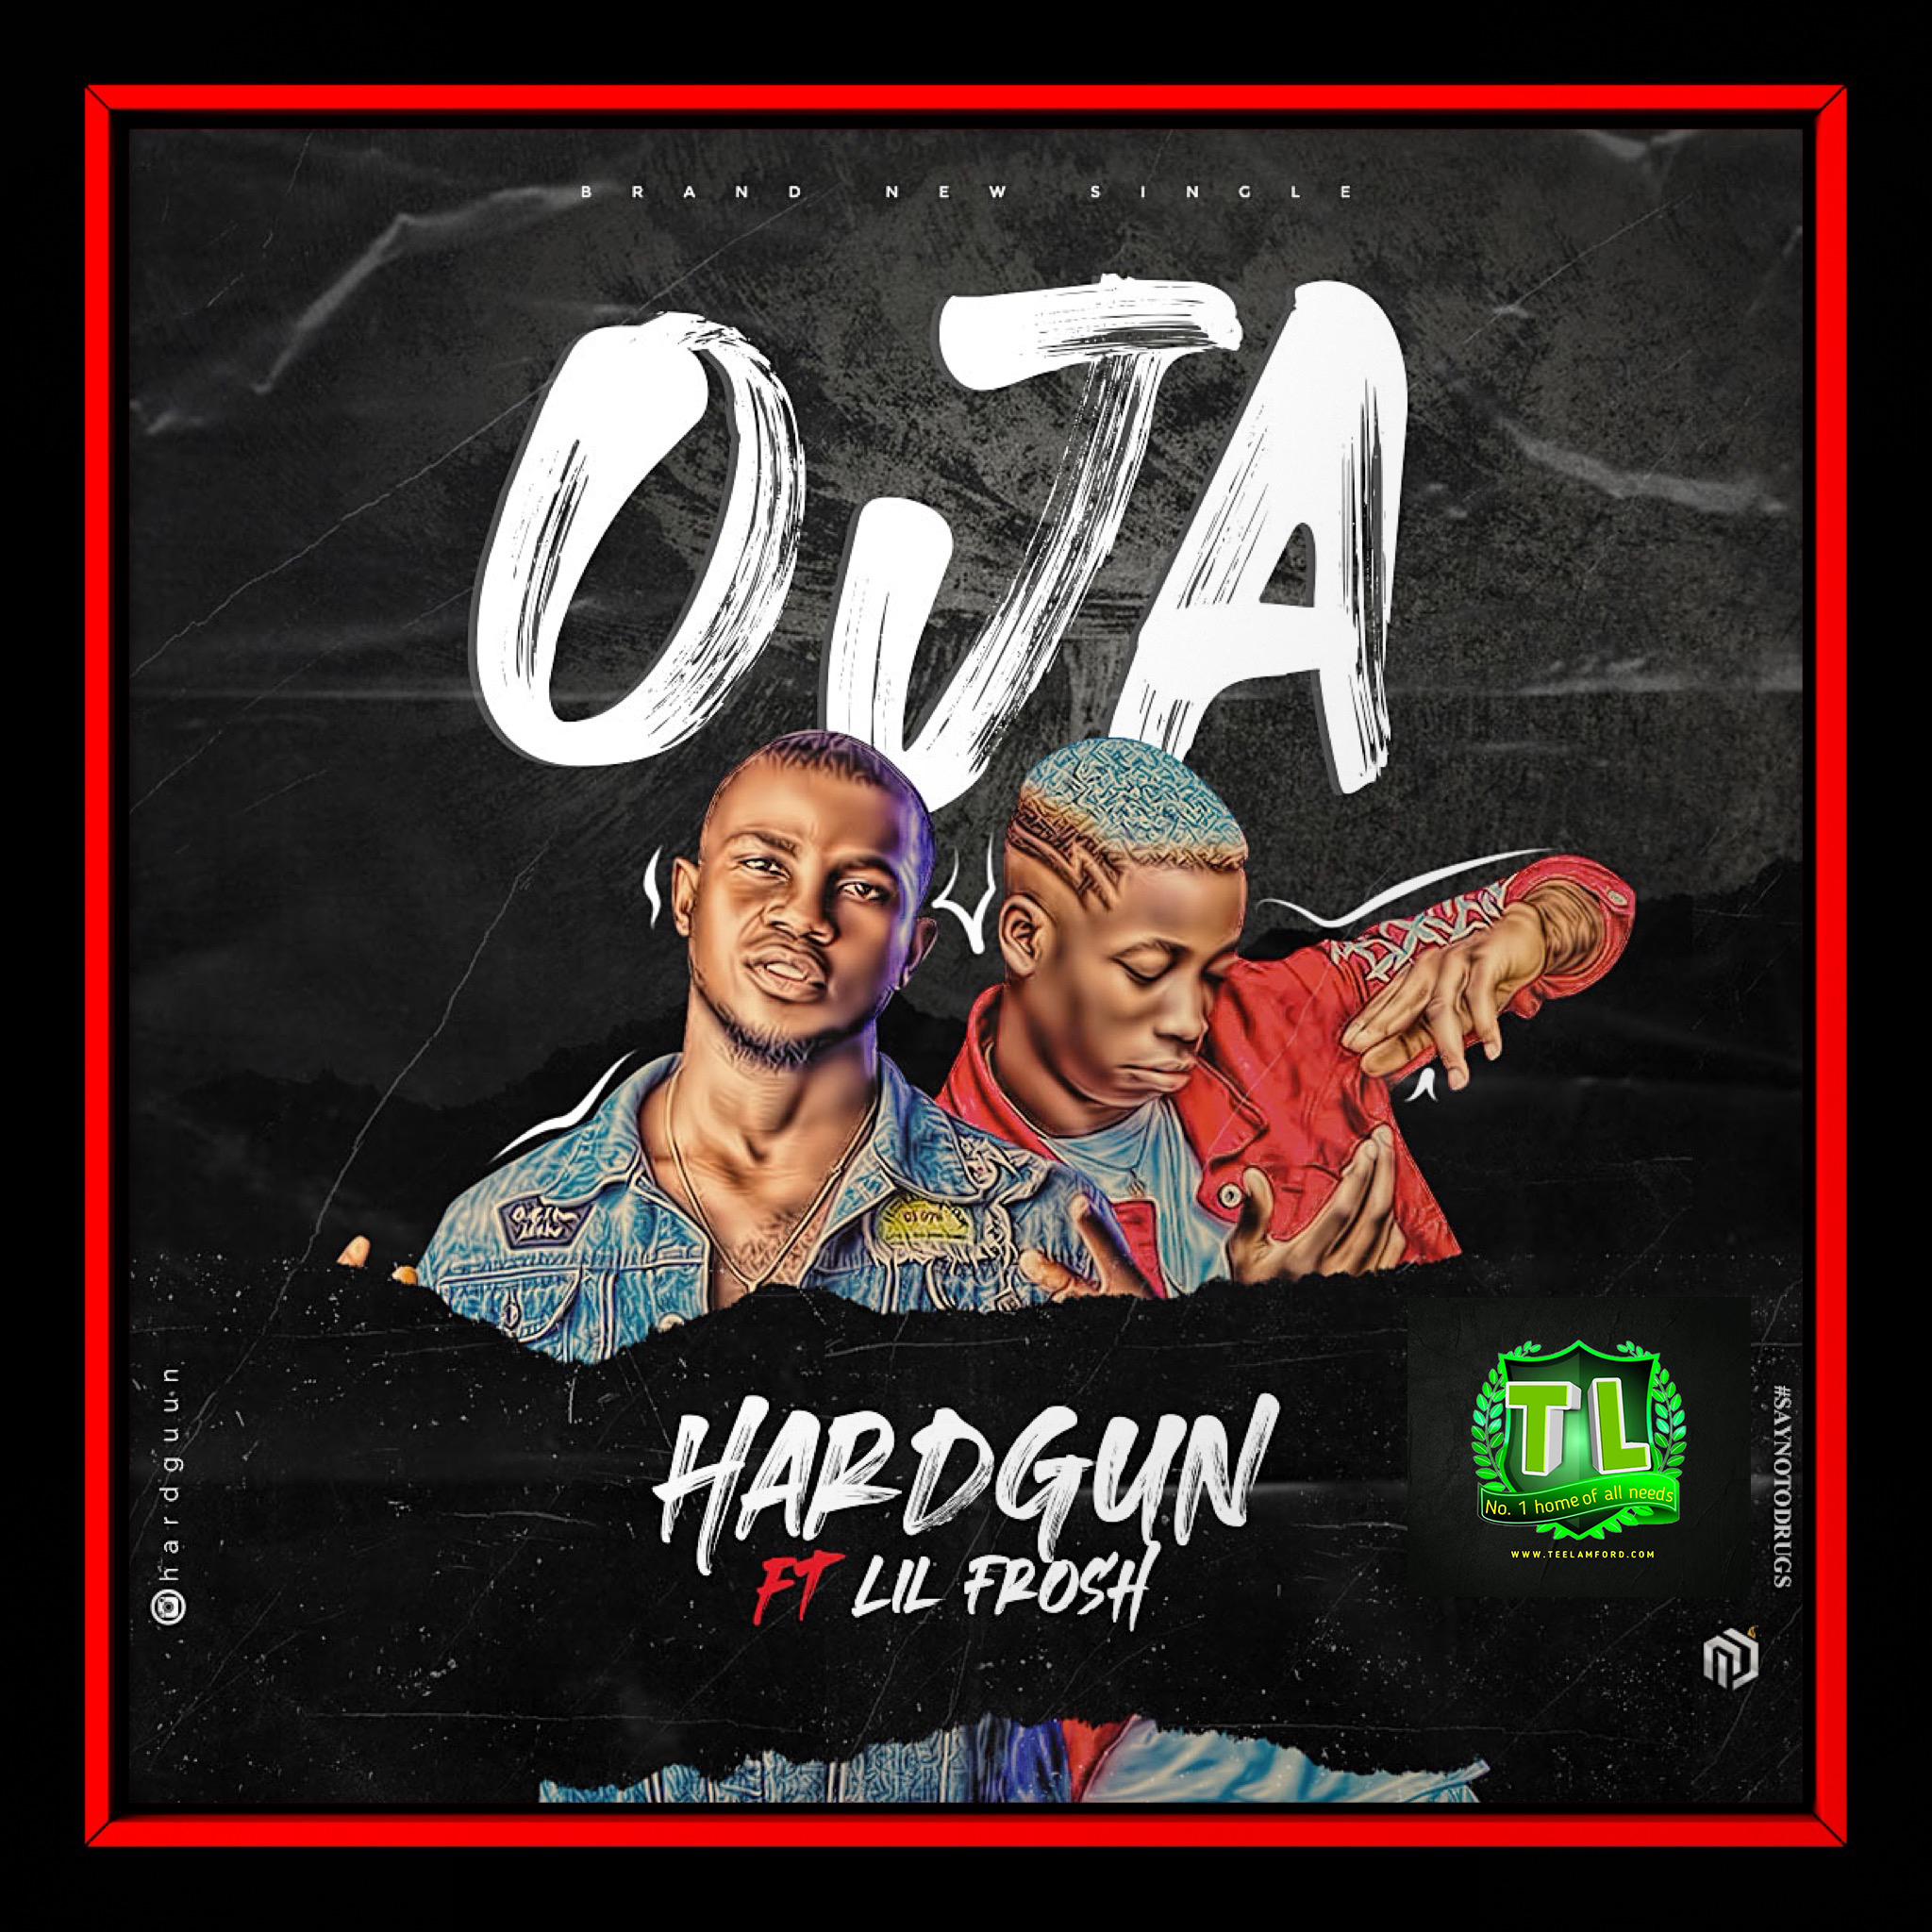 Hardgun-OJA-ft-Lil-Frosh-mp3-download-Teelamford